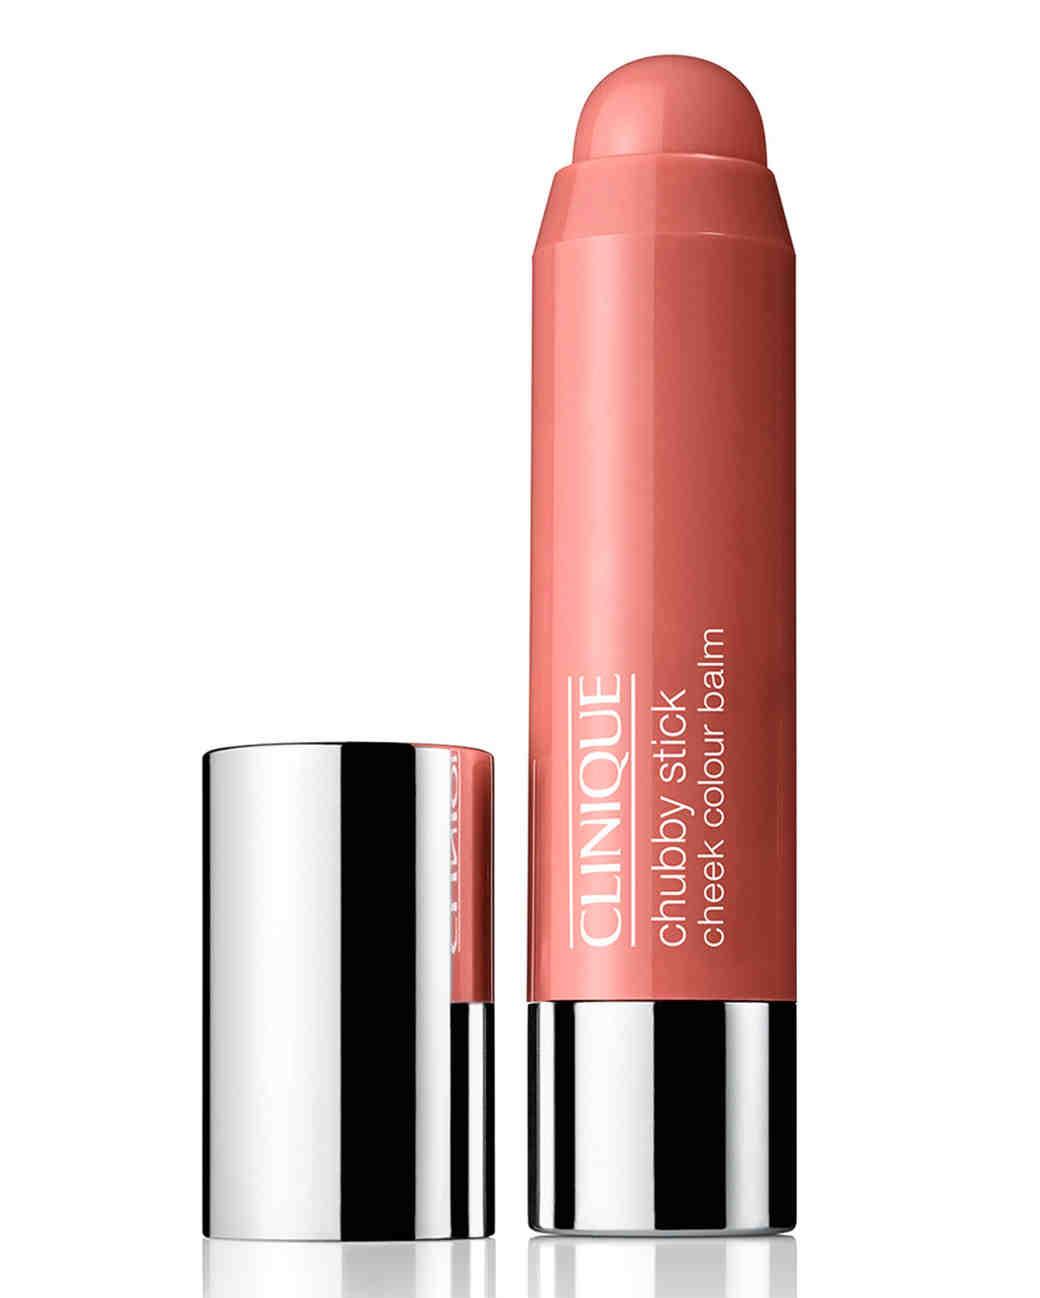 makeup-clutch-clinique-chubby-stick-cheek-colour-balm-0715.jpg